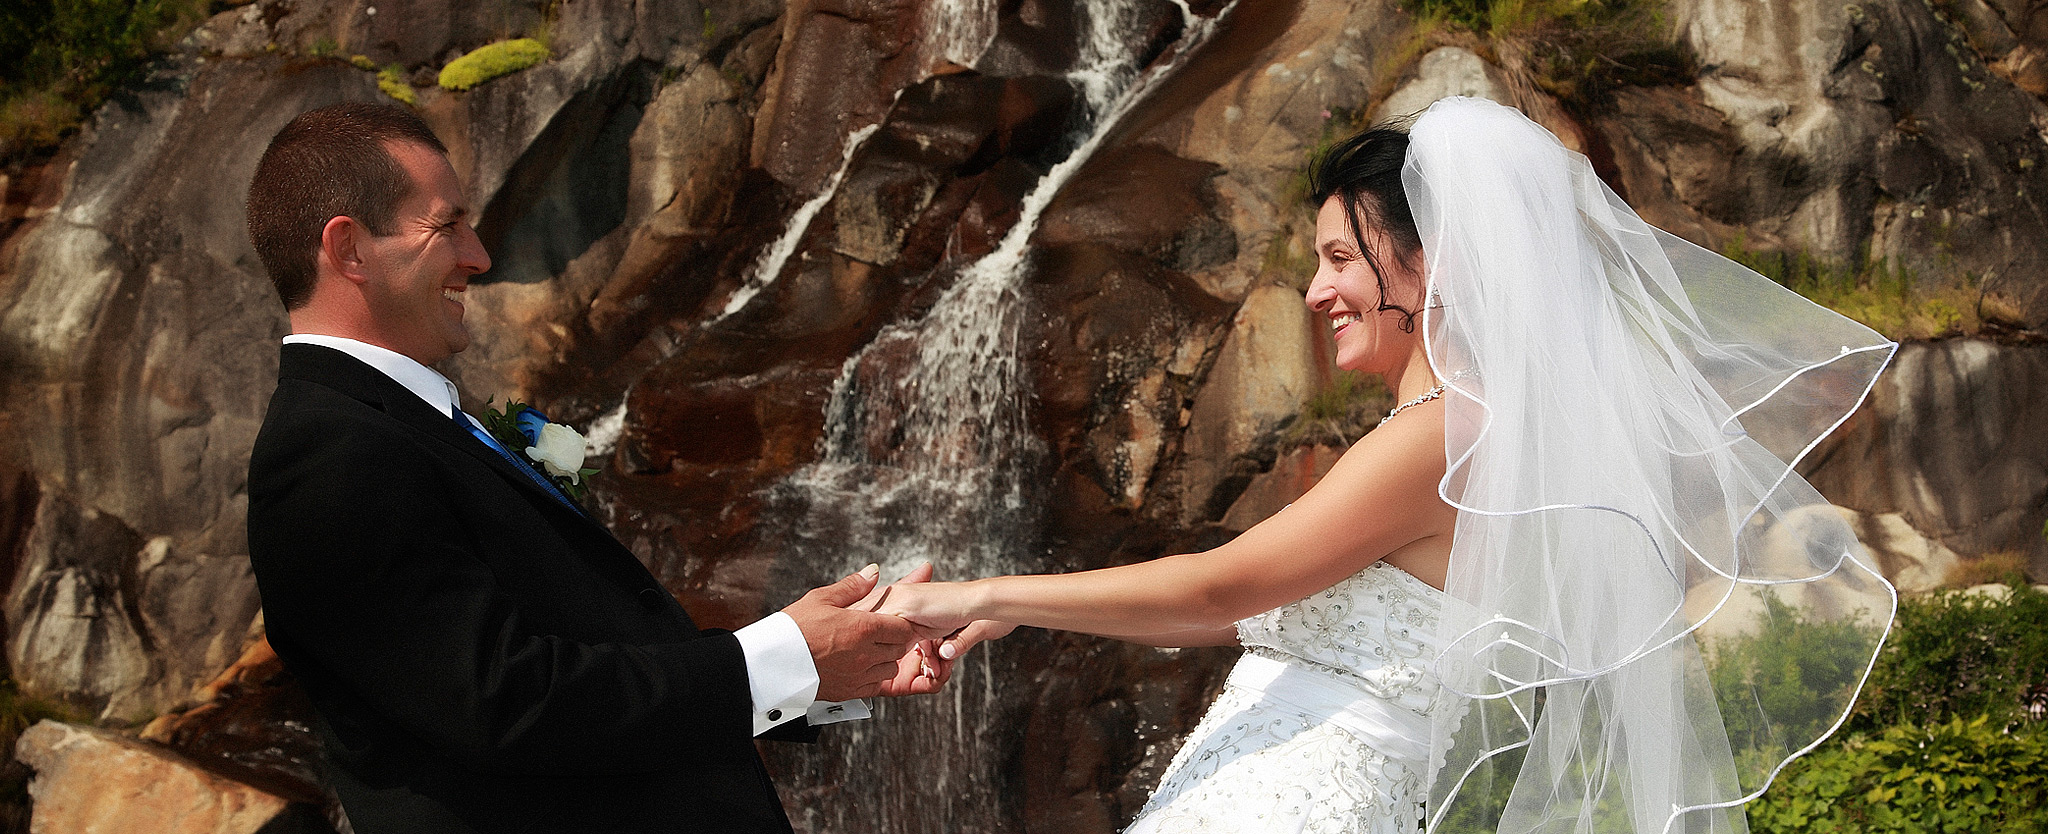 photographe-mariage-couple-golf-royal-laurentien-laurentides-rigaud-stephane-lariviere-photo-photographie